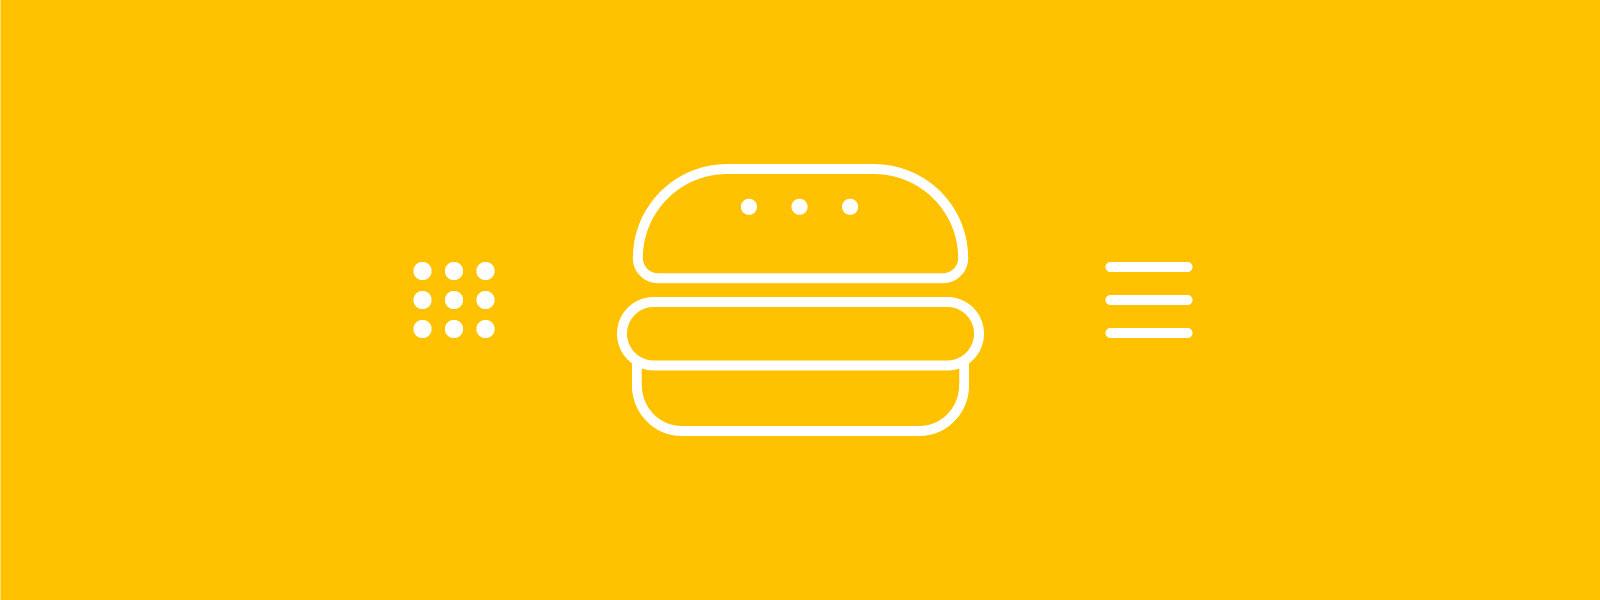 Hamburgeren: Den skjulte navigation